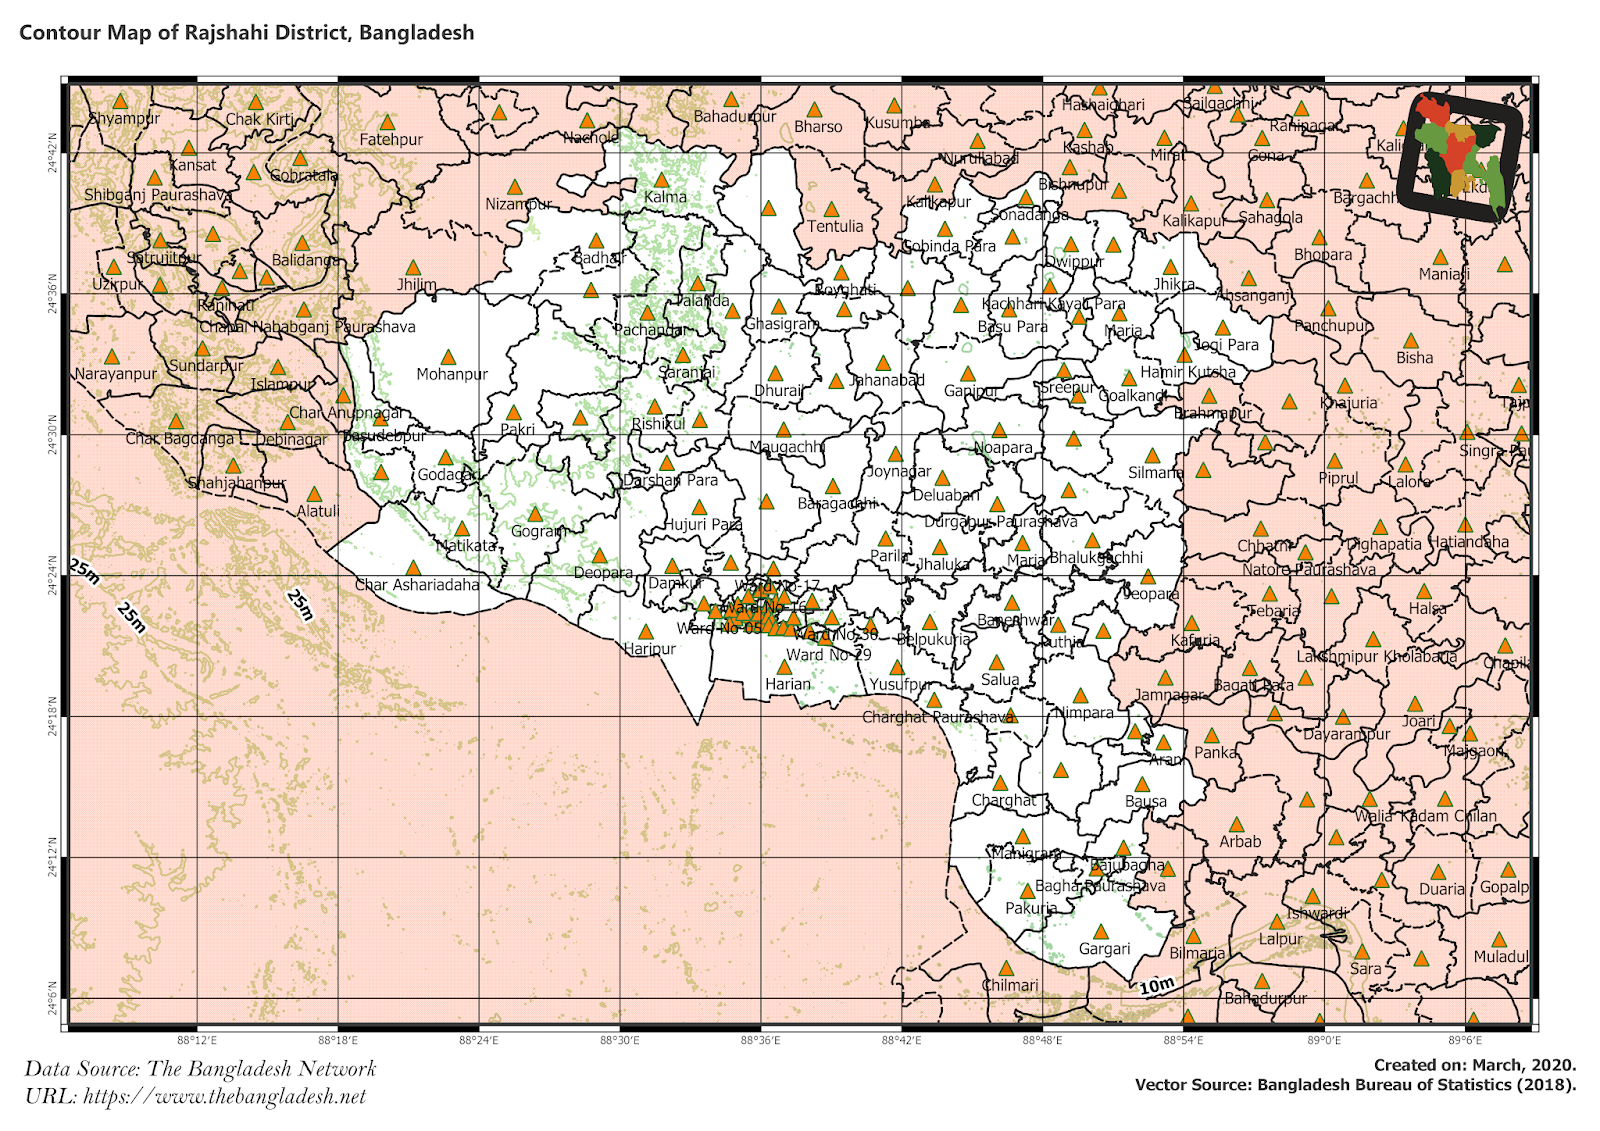 Elevation Map of Rajshahi District of Bangladesh